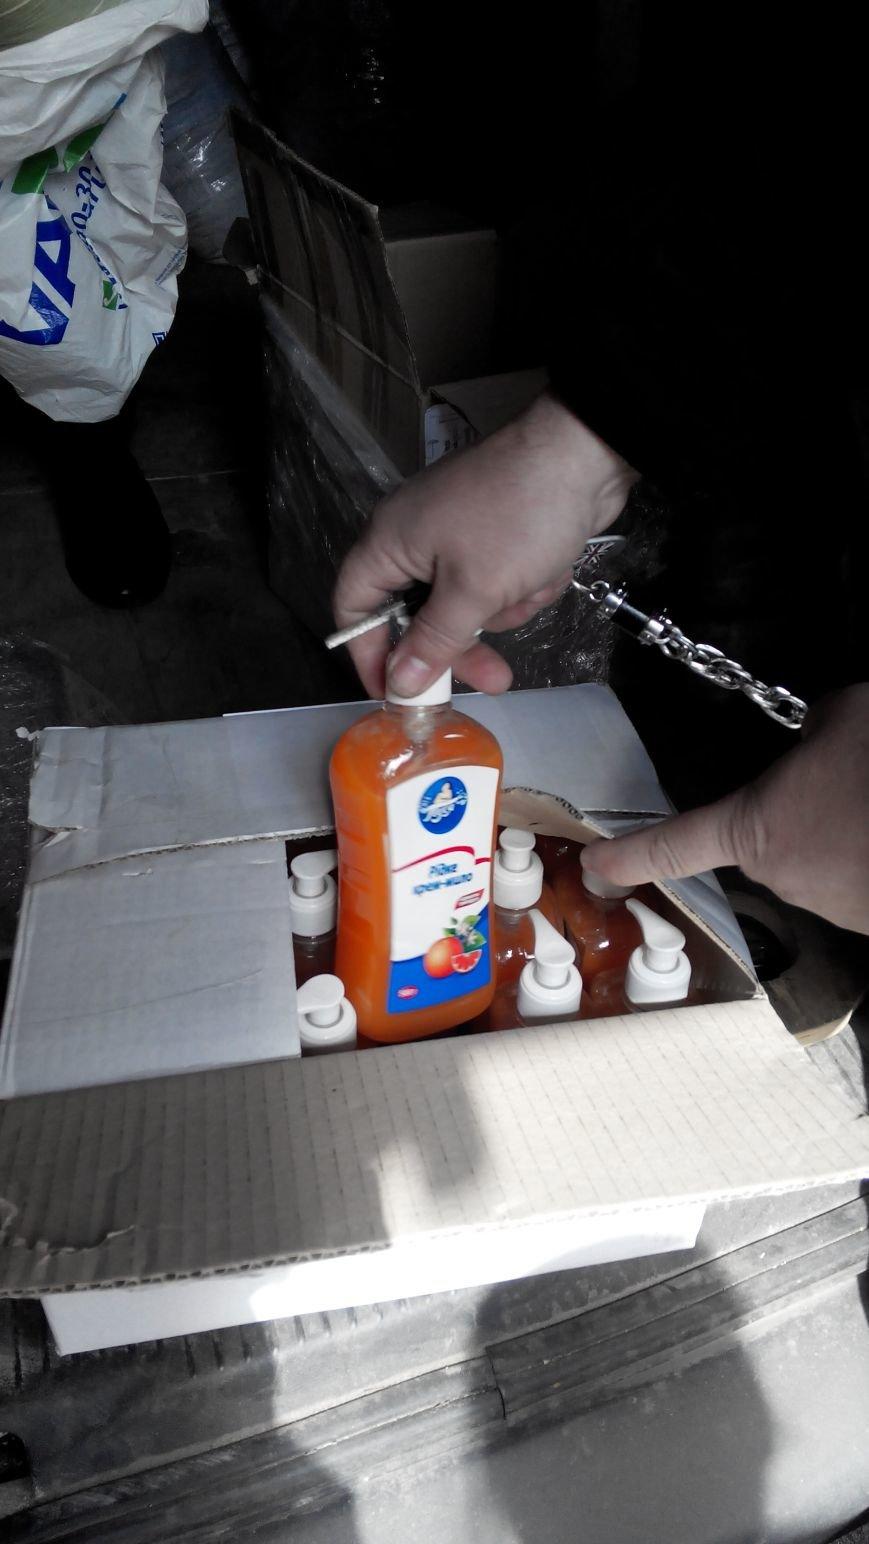 Краматорскому приюту привезли навязчивую помощь из Днепропетровска (фото) - фото 1